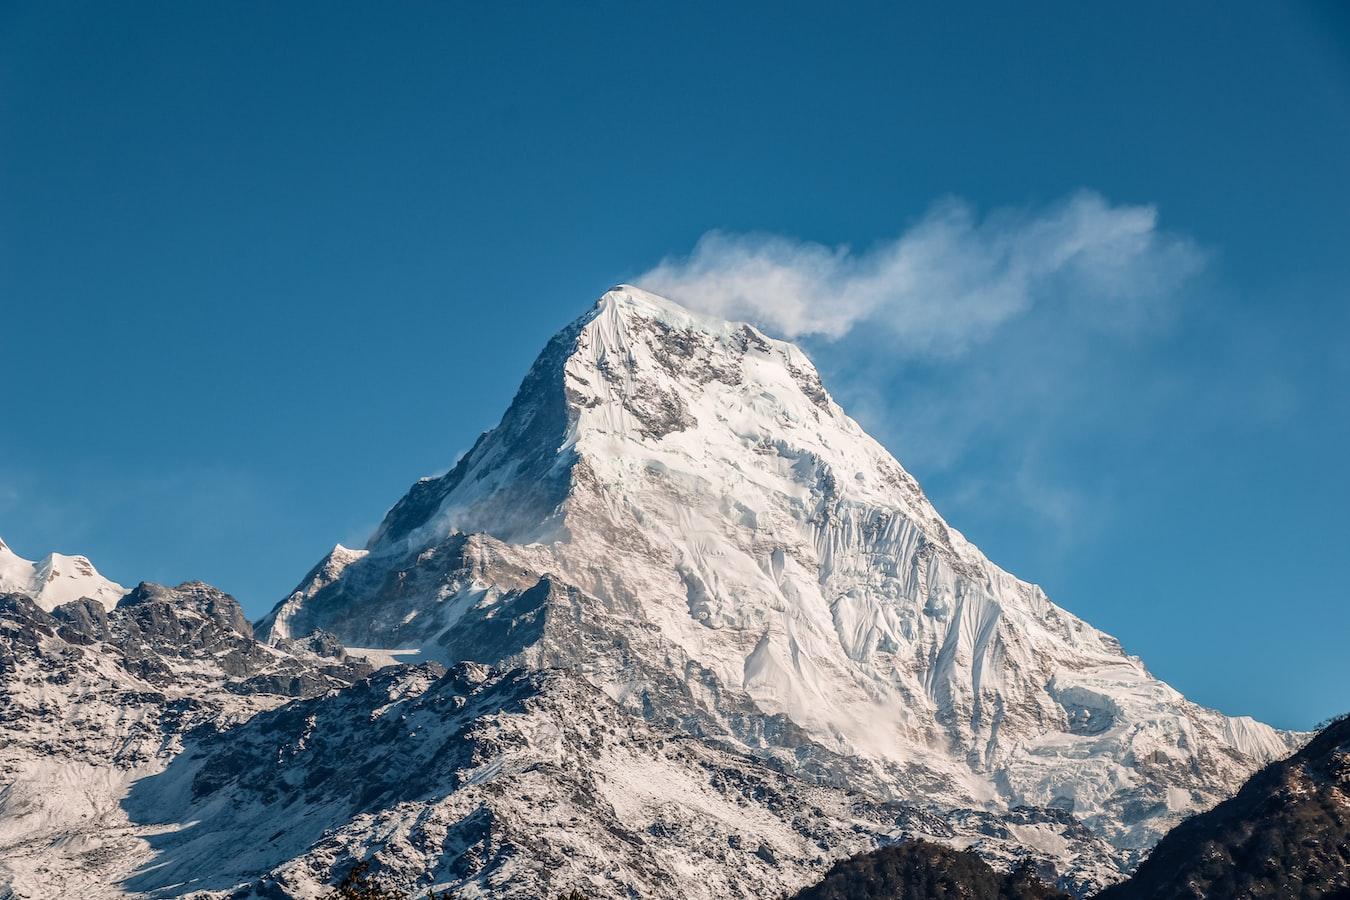 A Himalayan mountain near Kathmandu, Nepal